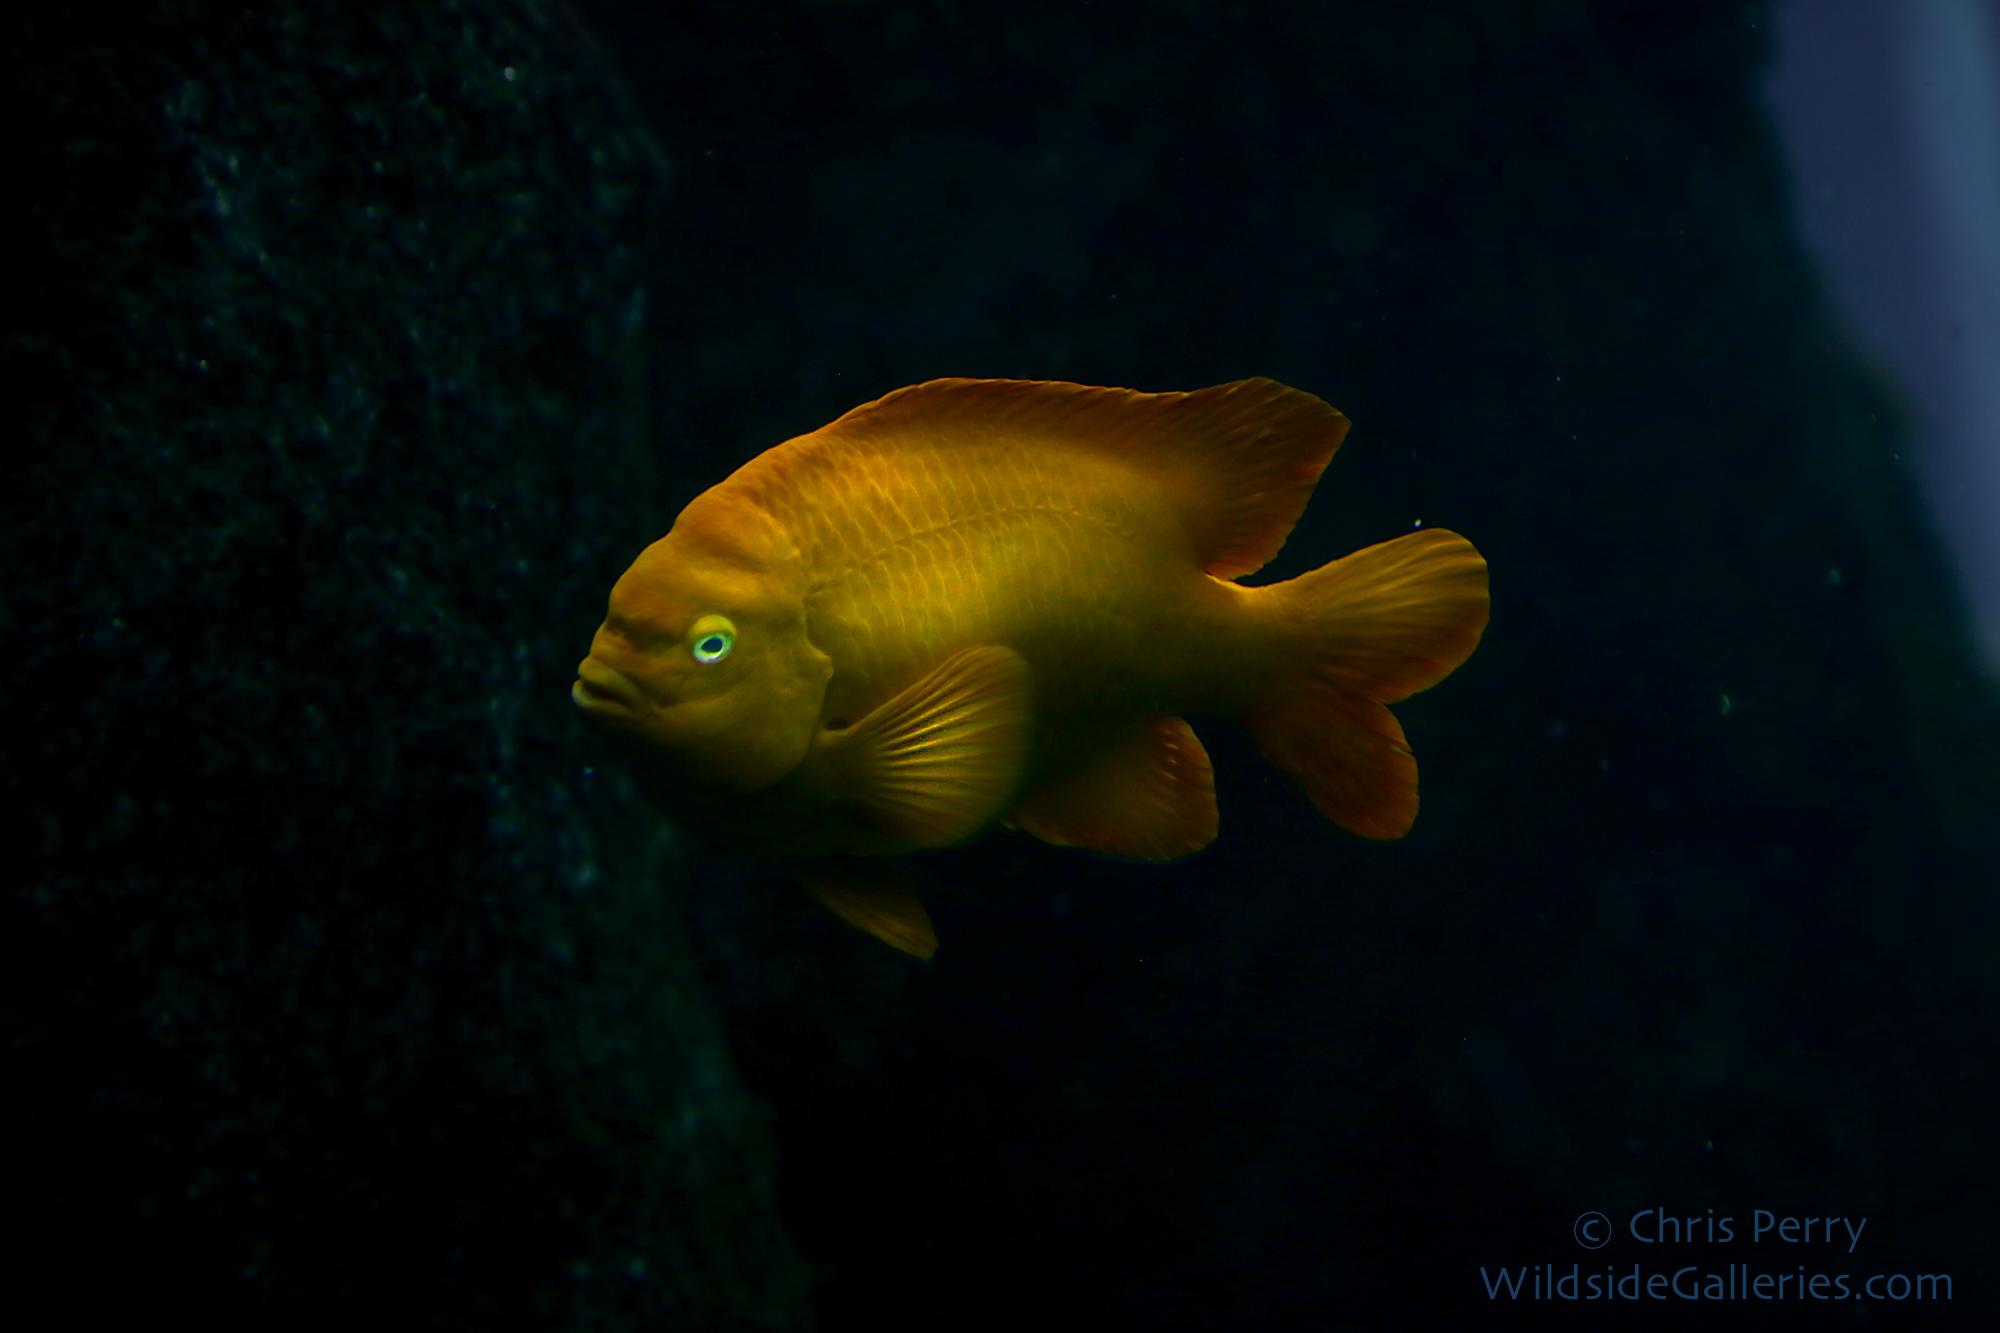 California's State Fish